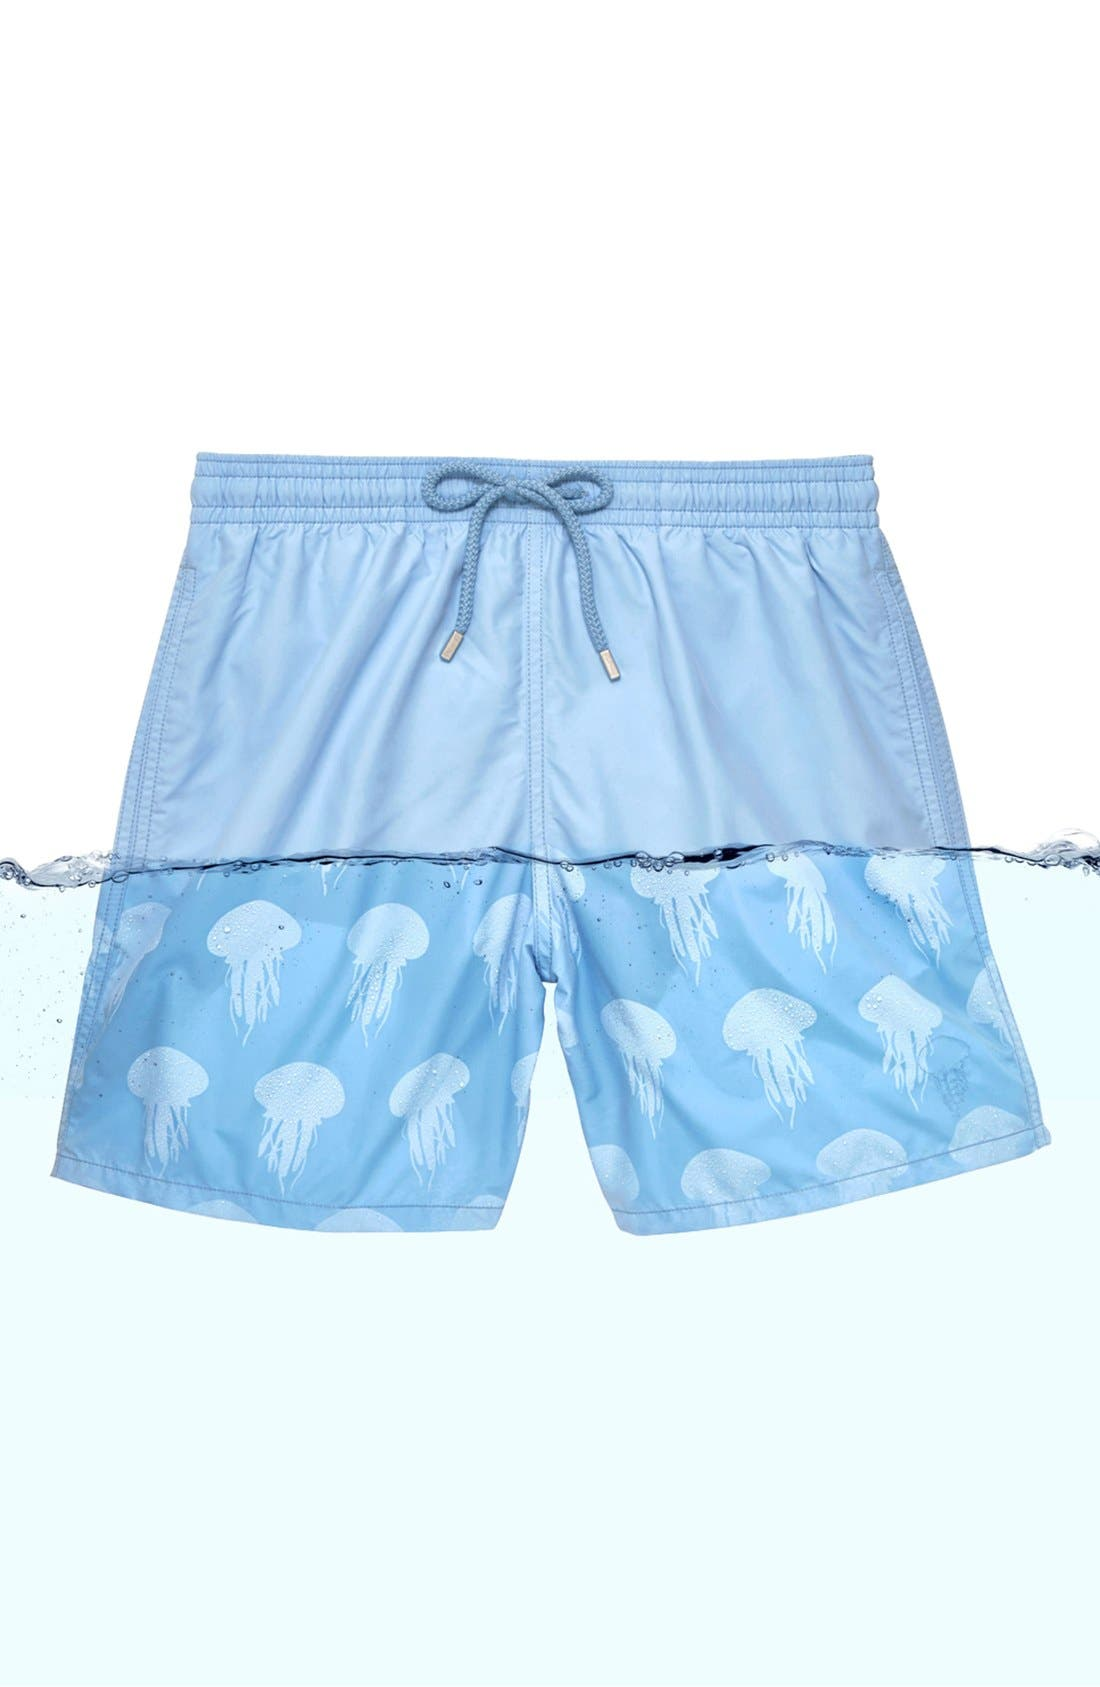 'Moorea' Water Reactive Jellyfish Print Swim Trunks,                             Alternate thumbnail 3, color,                             450